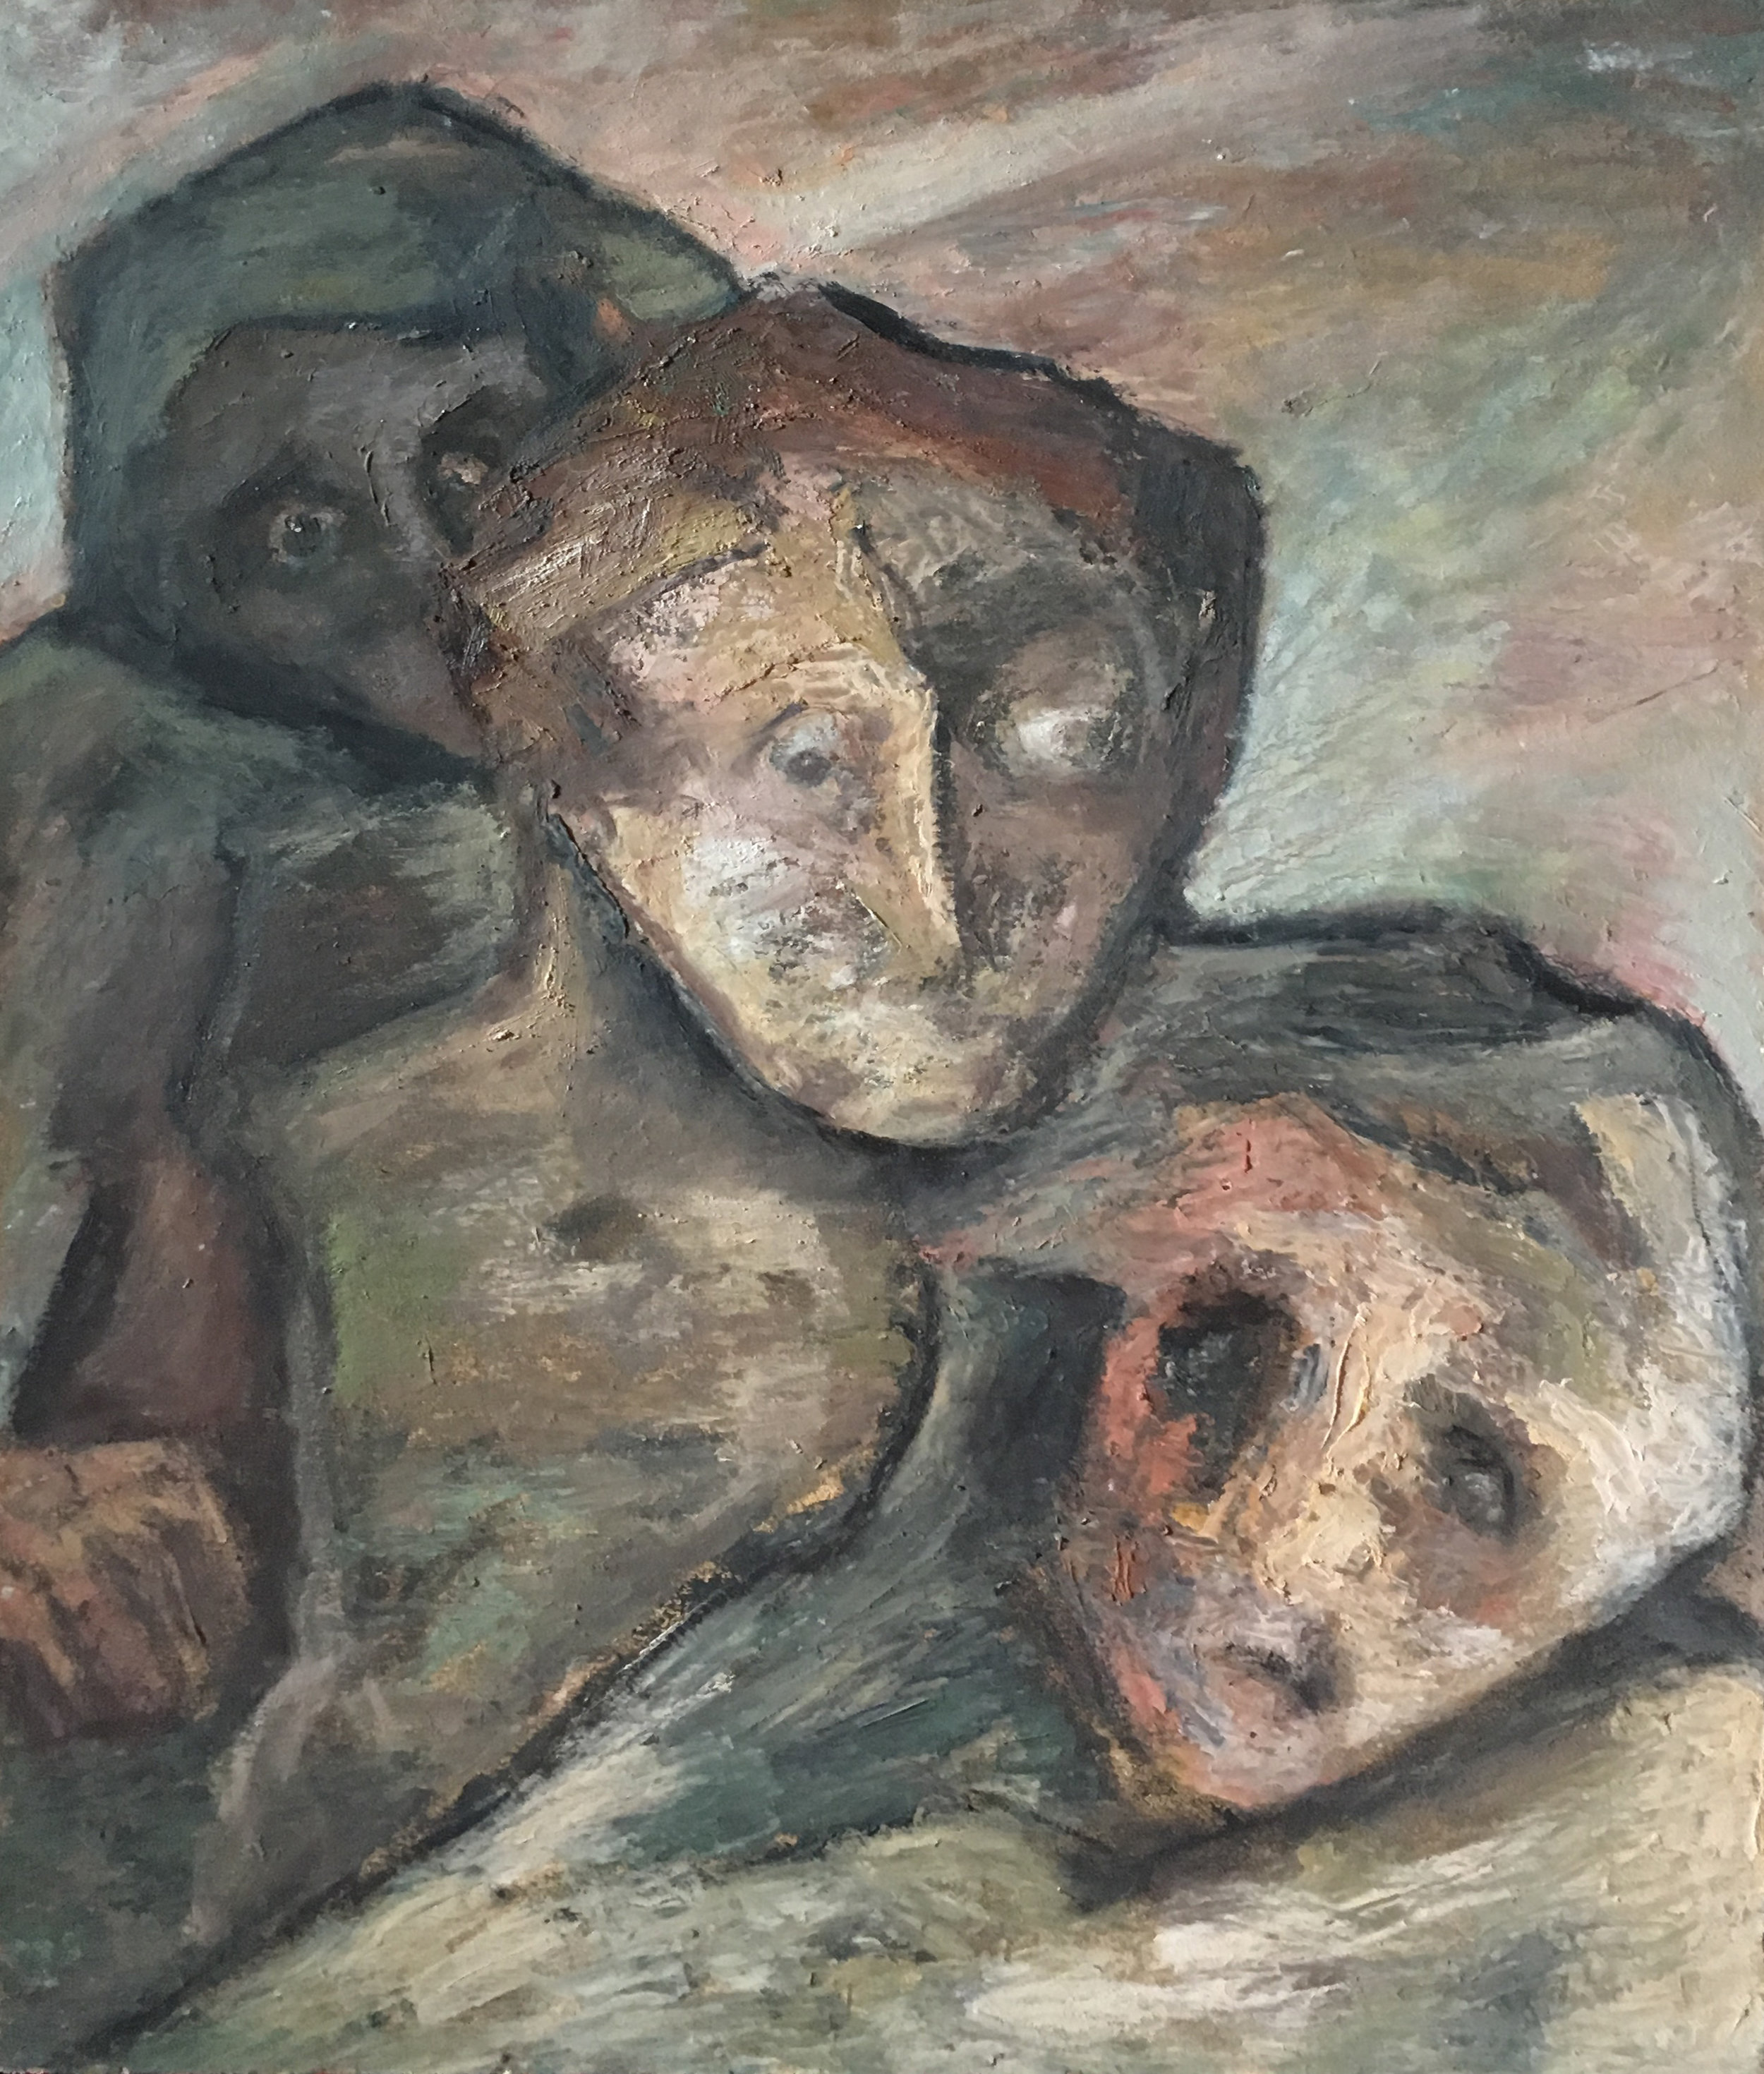 <b>Metamorphoses of the spirit</b><br> (Orig.Metamorfosi dello spirito) <br> 1974 Oil on wood <br> cm 60 x 80